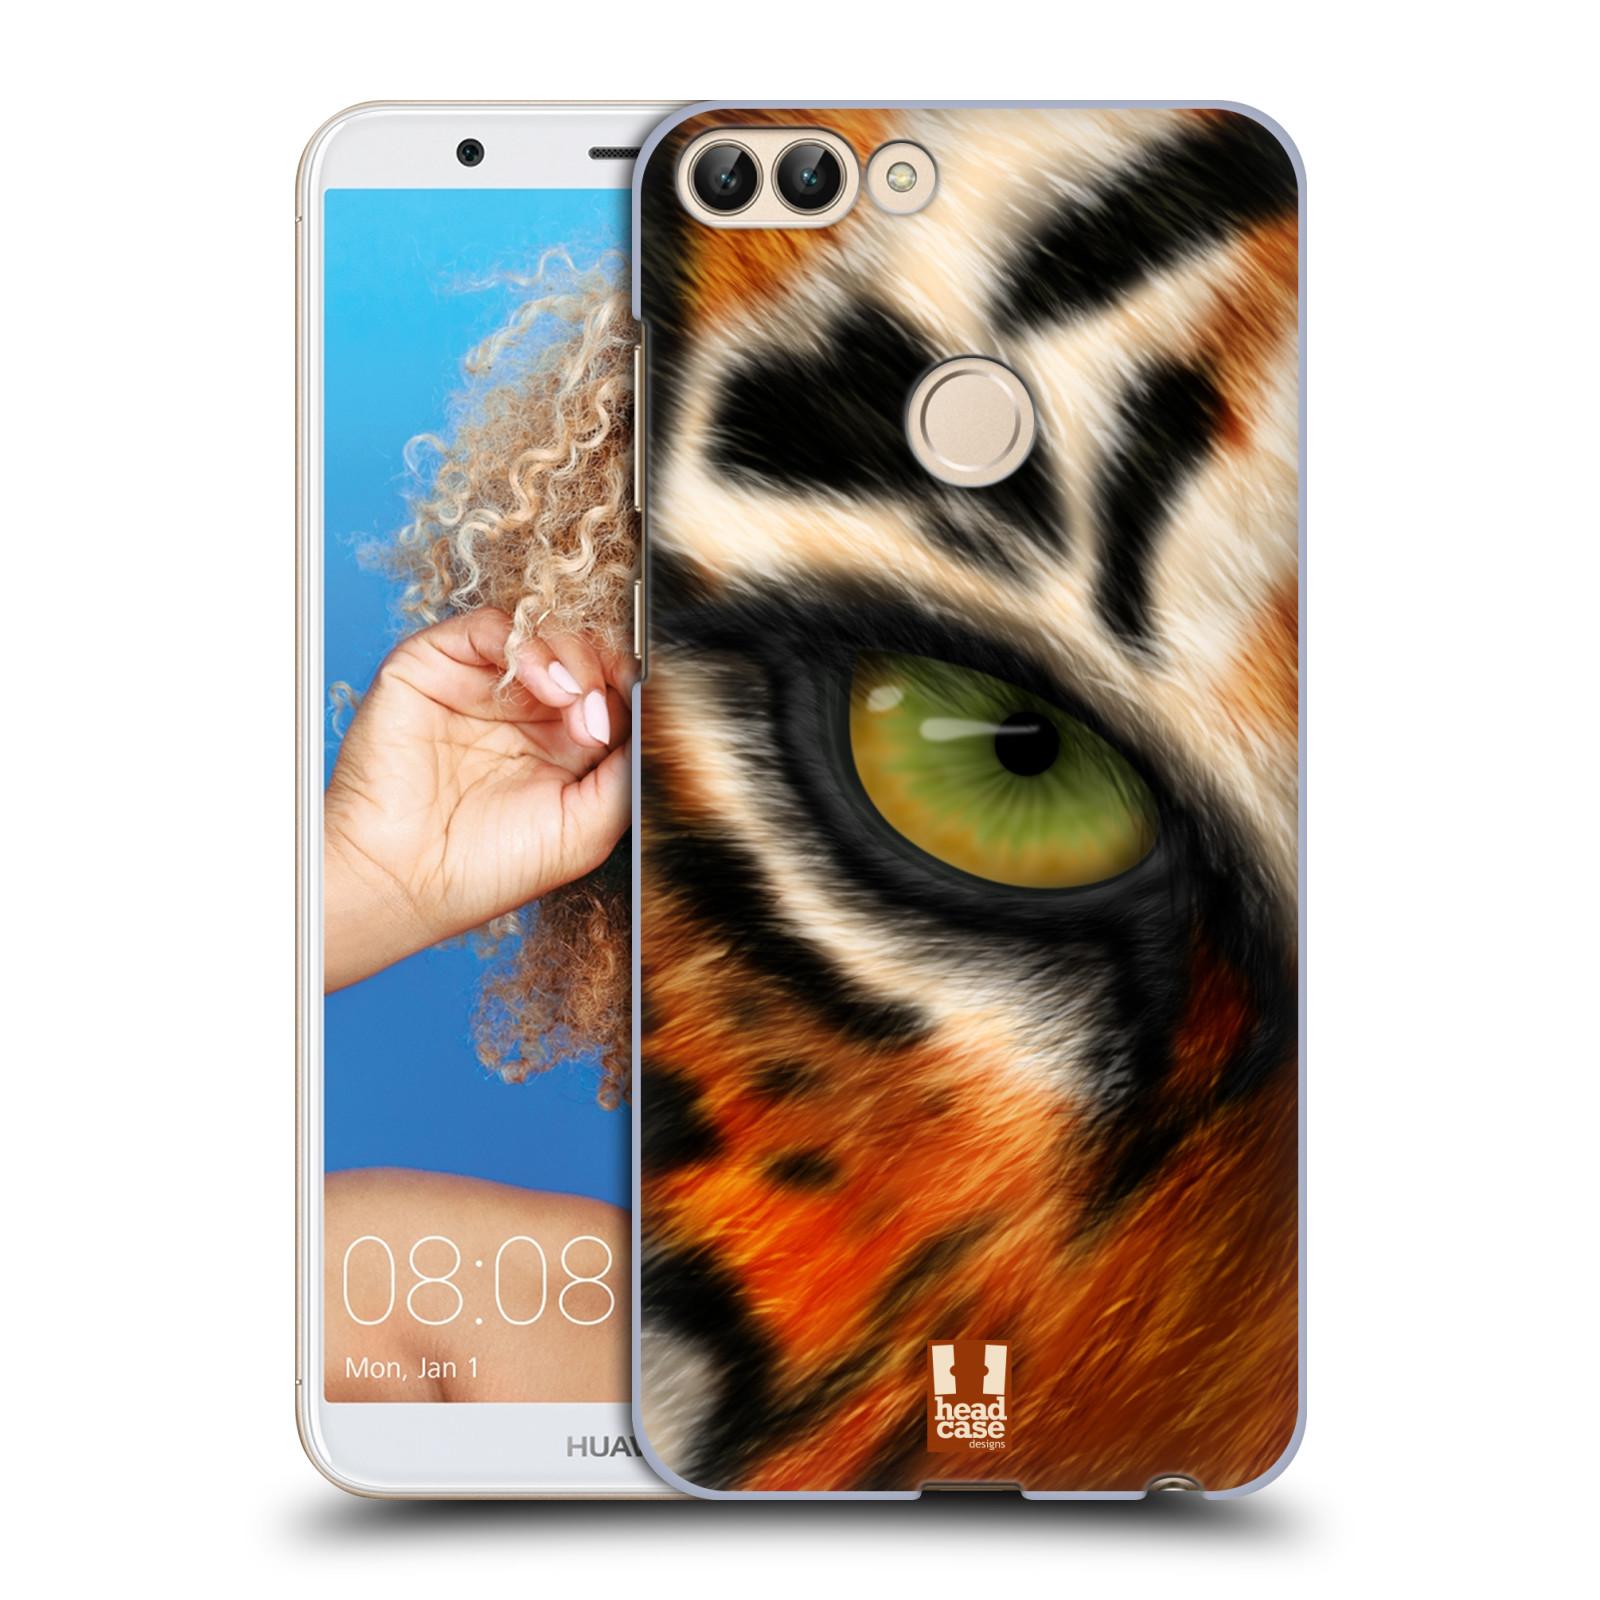 HEAD CASE plastový obal na mobil Huawei P Smart vzor pohled zvířete oko tygr